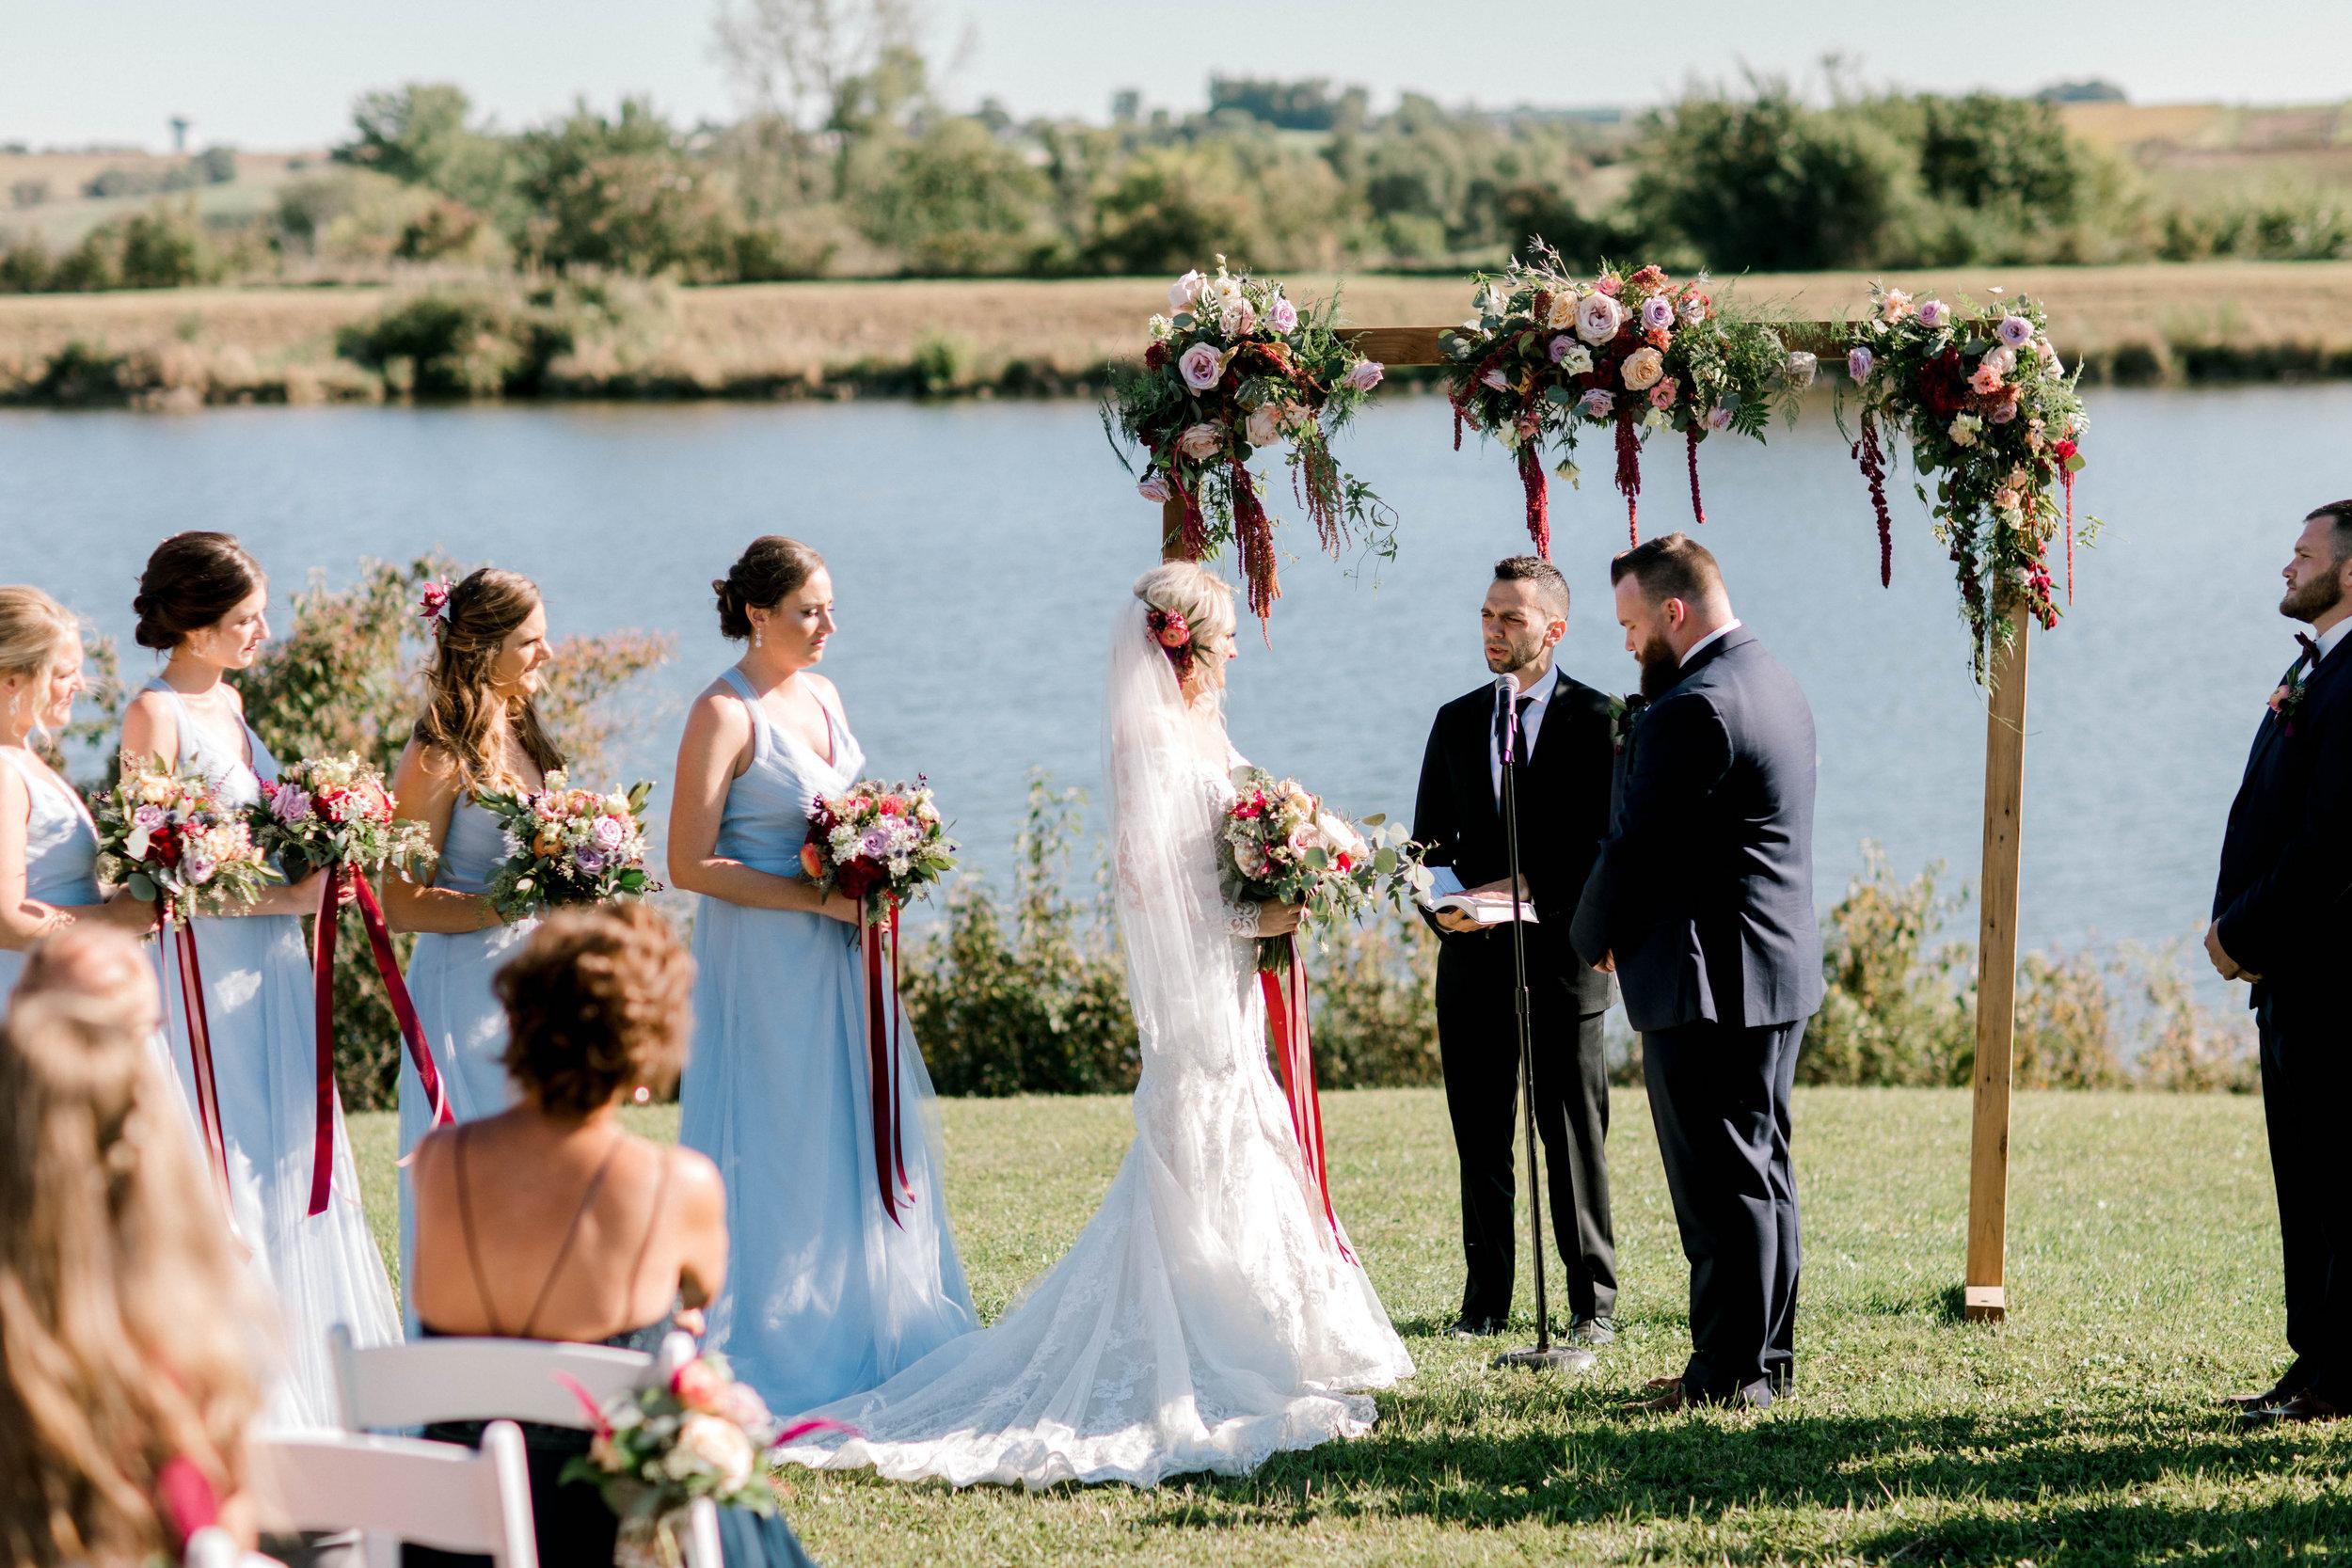 Ryan Alexa Married-Formals Ceremony-0166.jpg